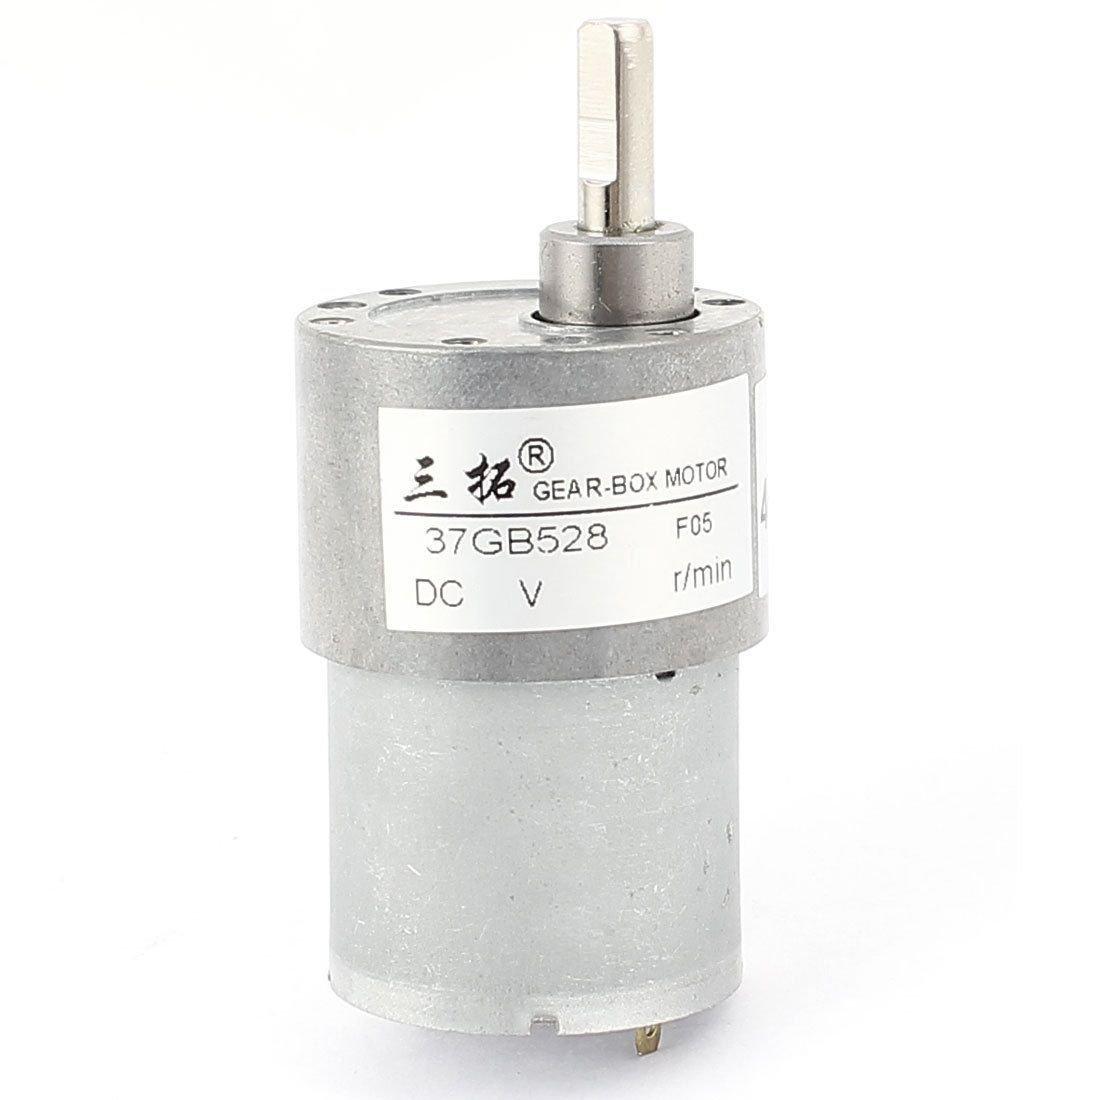 DC 12V 50RPM 0.2A 1.6KG.cm High Torque DC Gear Box Reducer Variable Speed Motor